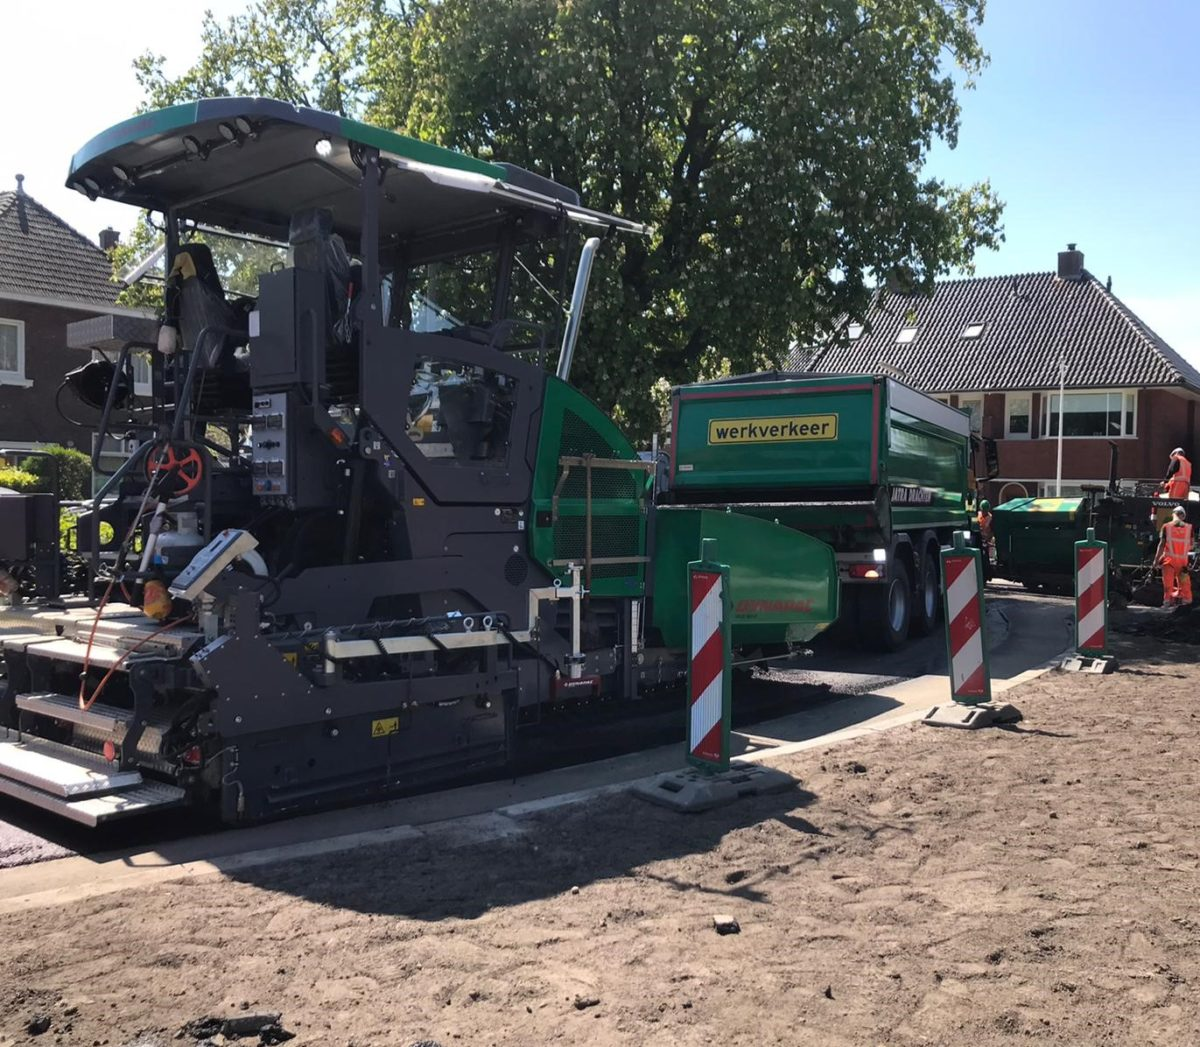 Asfaltspreidmachine-groen-kiepauto-Leeuwarden-mei-2020-asfalteren-TjerkHiddesstraat